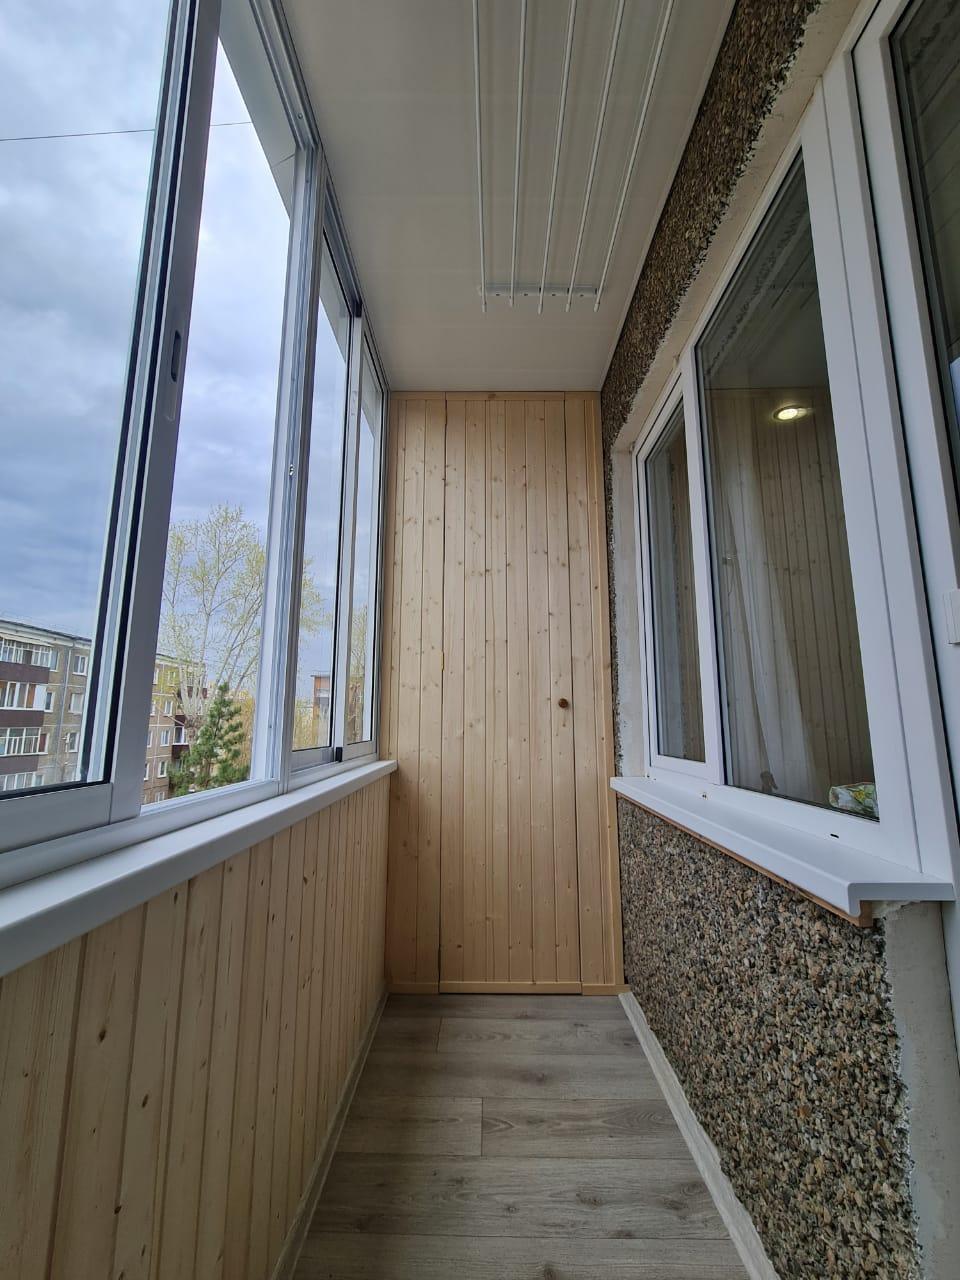 Обшивка балкона и установка стеклопакета Декабристов 109 - фото